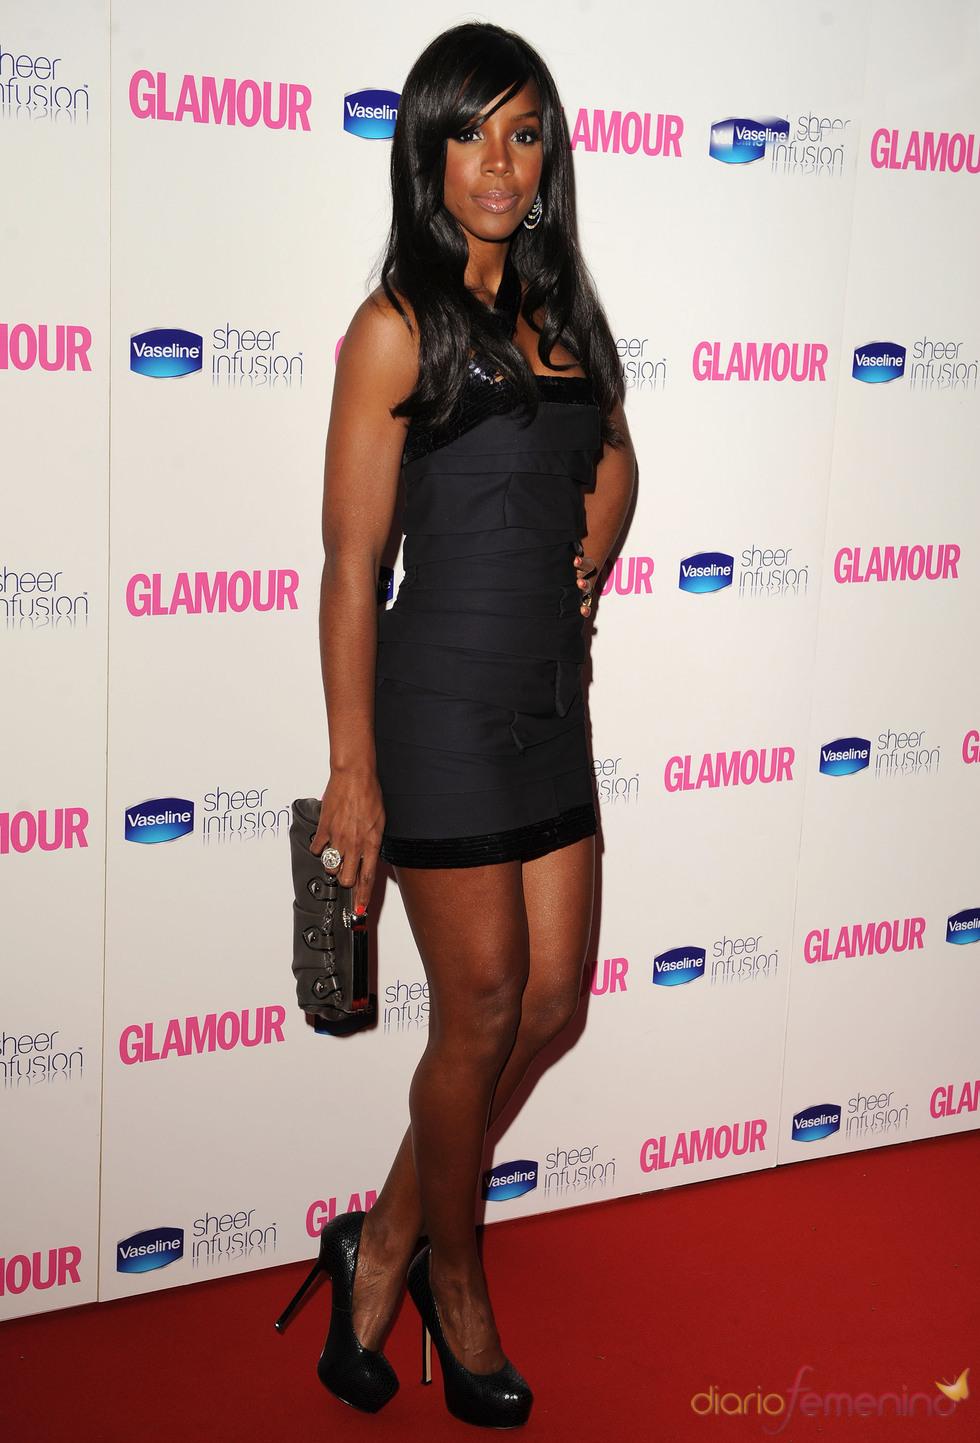 Kelly Rowland en los Premios Glamour 2010